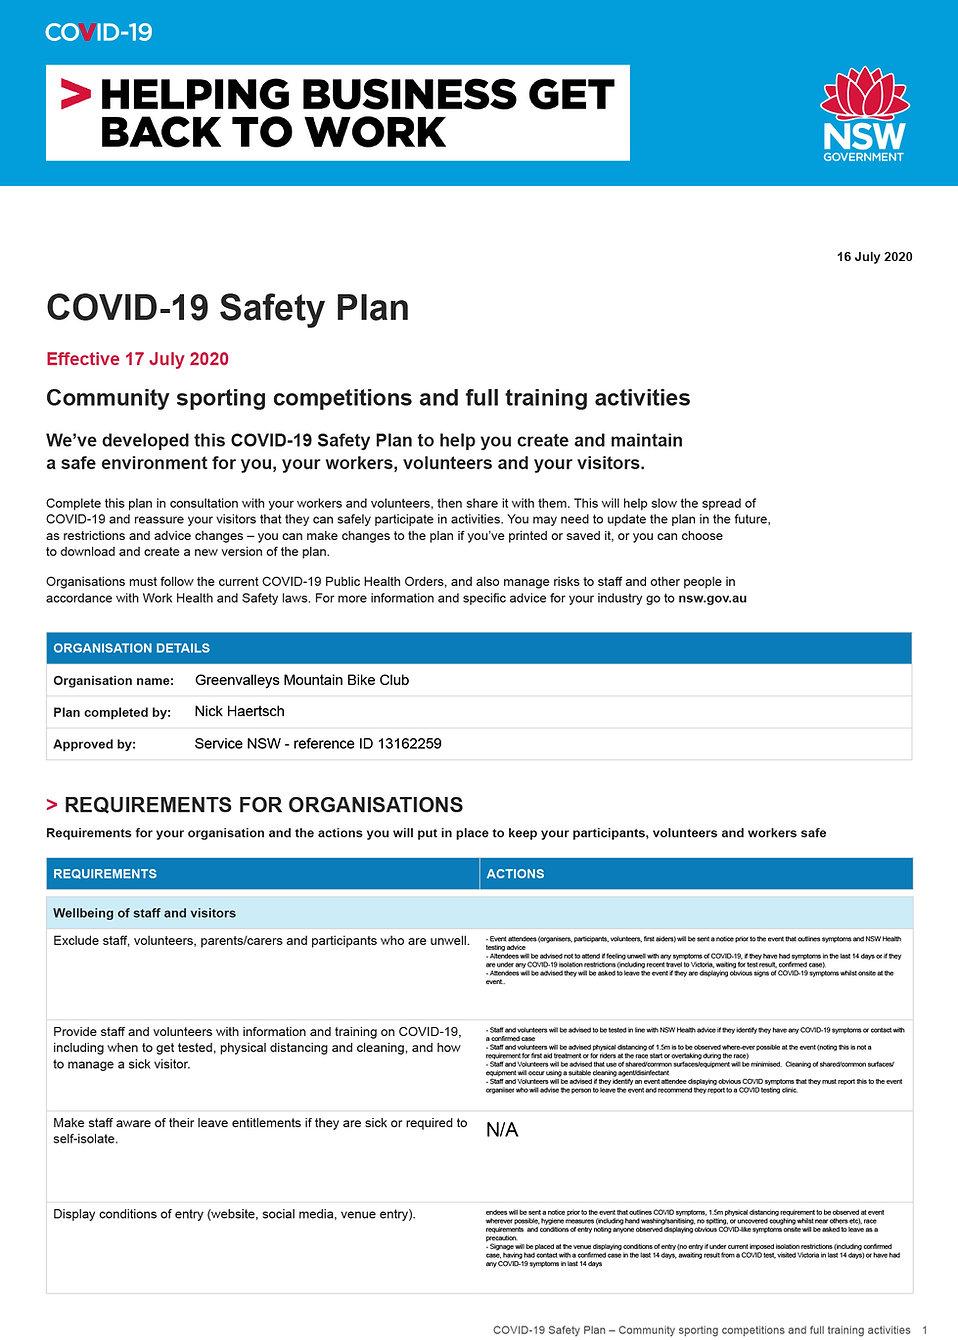 COVID-19 Safety Plan 2020 community spor